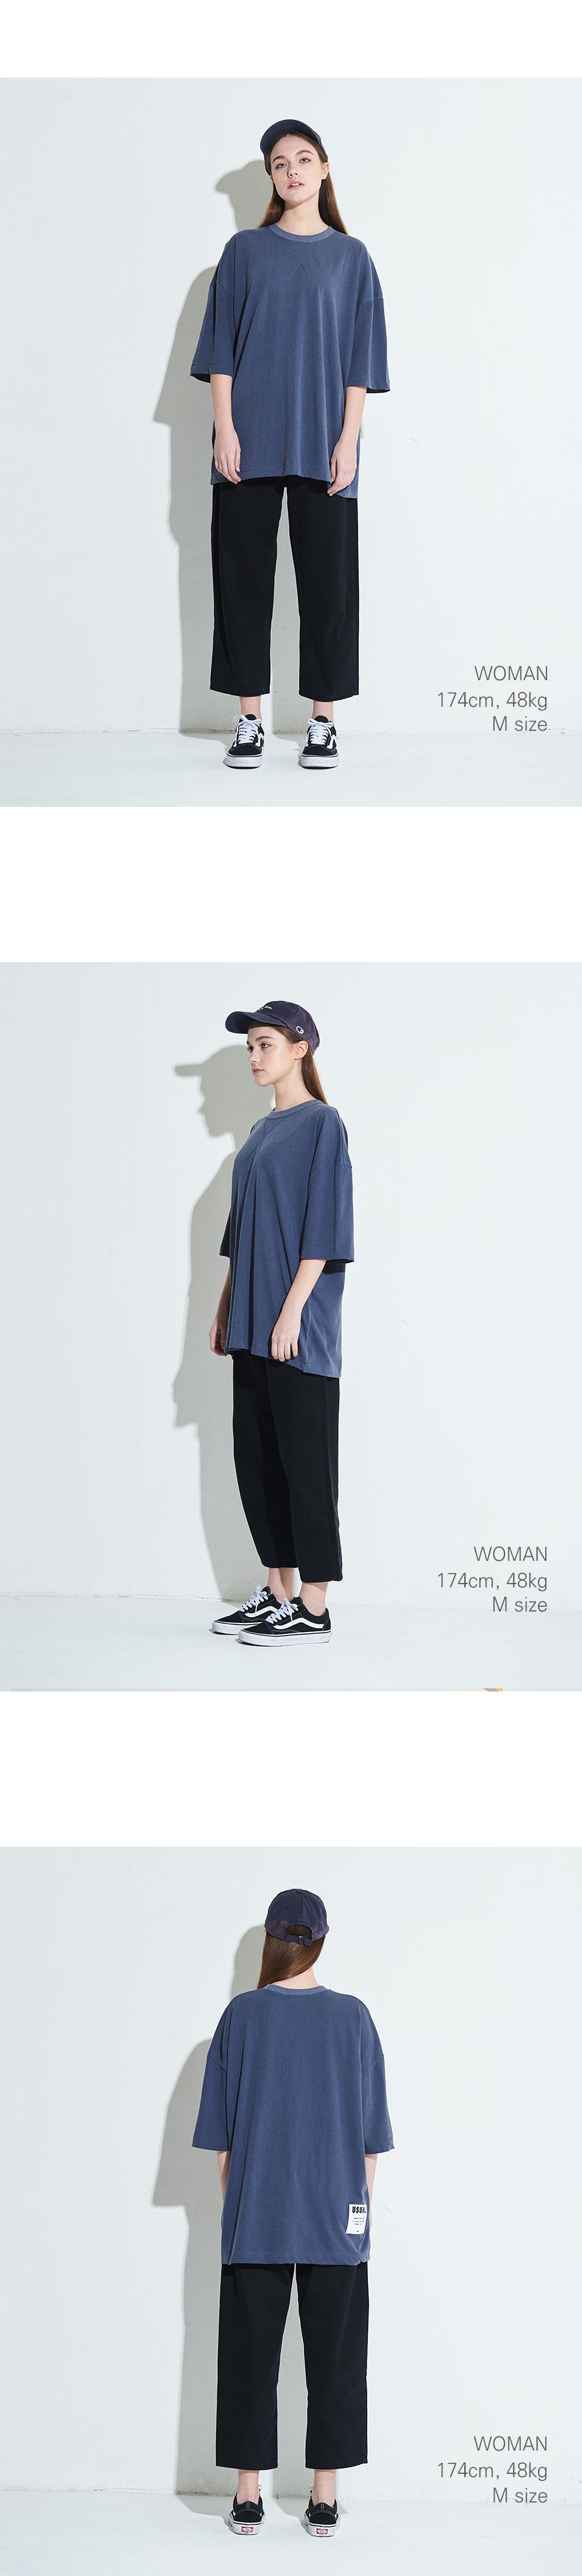 xtt004_nv_woman_1.jpg